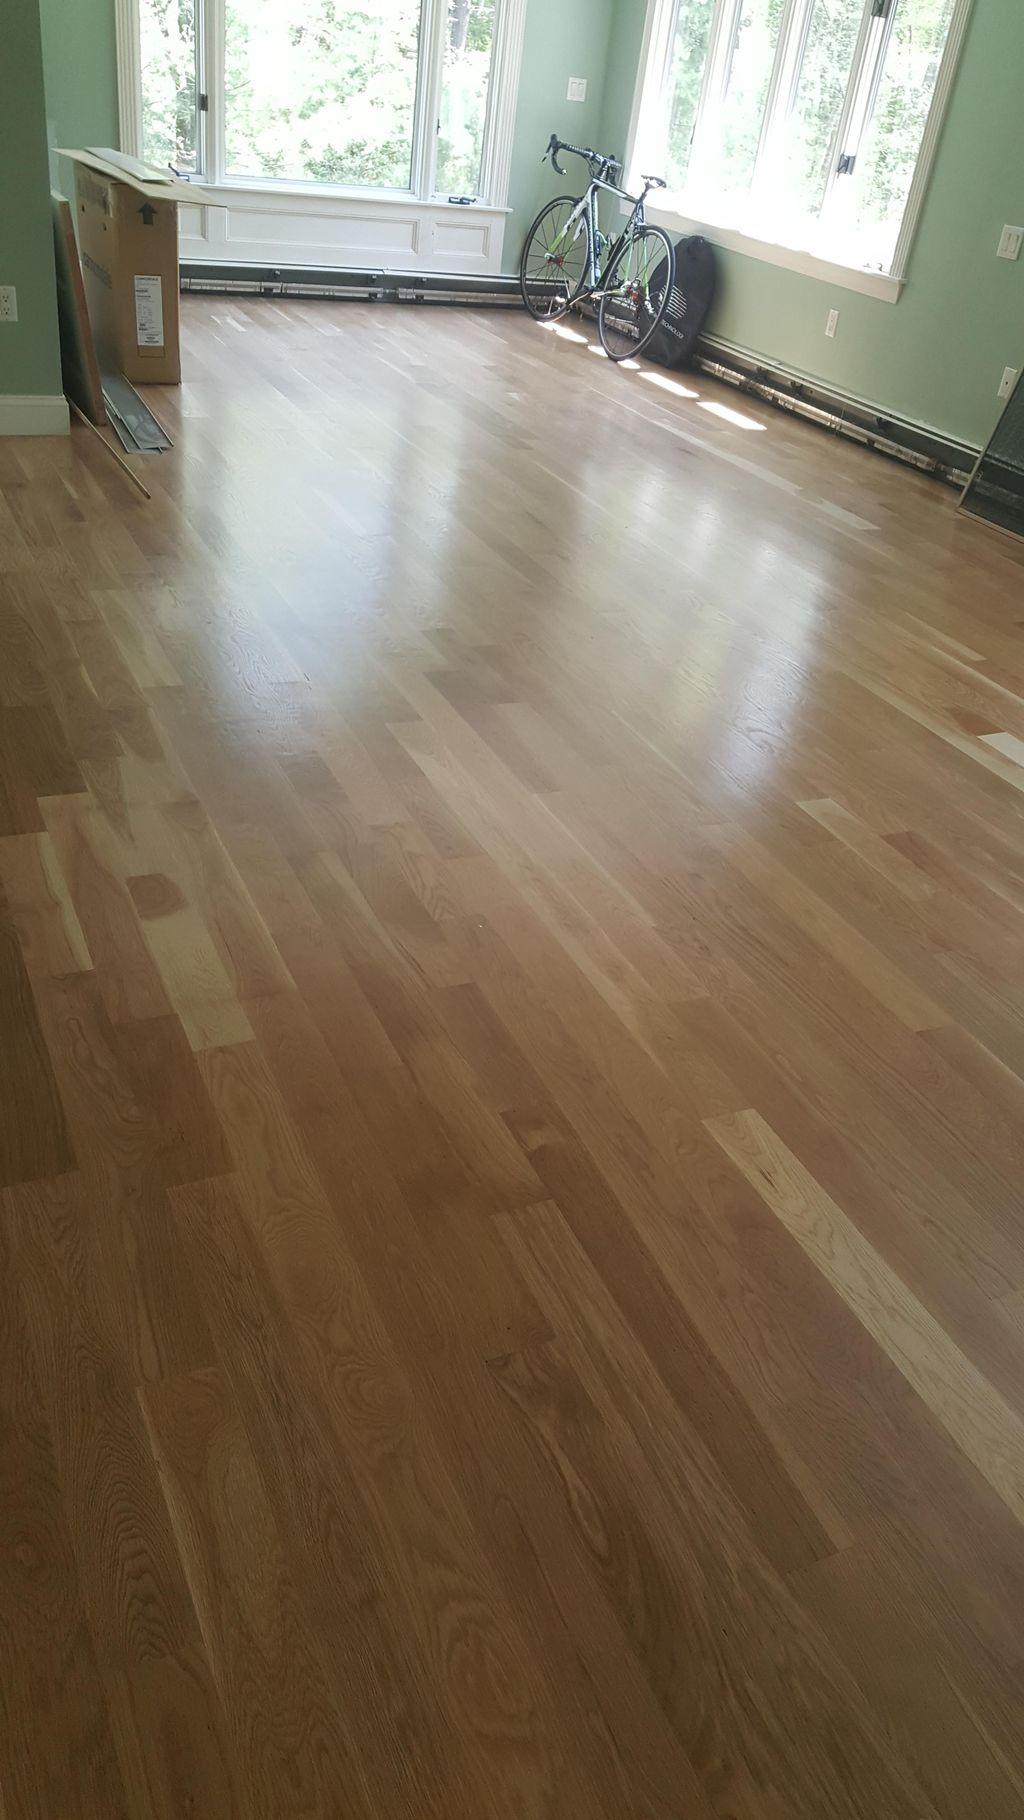 Peter's hardwood floors